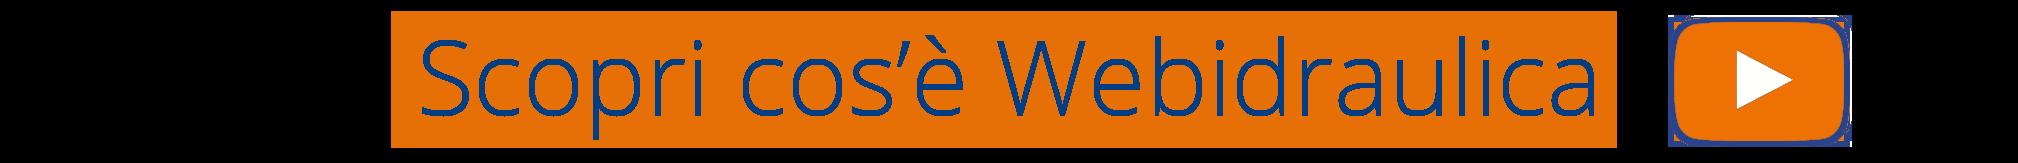 Video illustrativo di presentazione - webidraulica.it - webidraulica.it